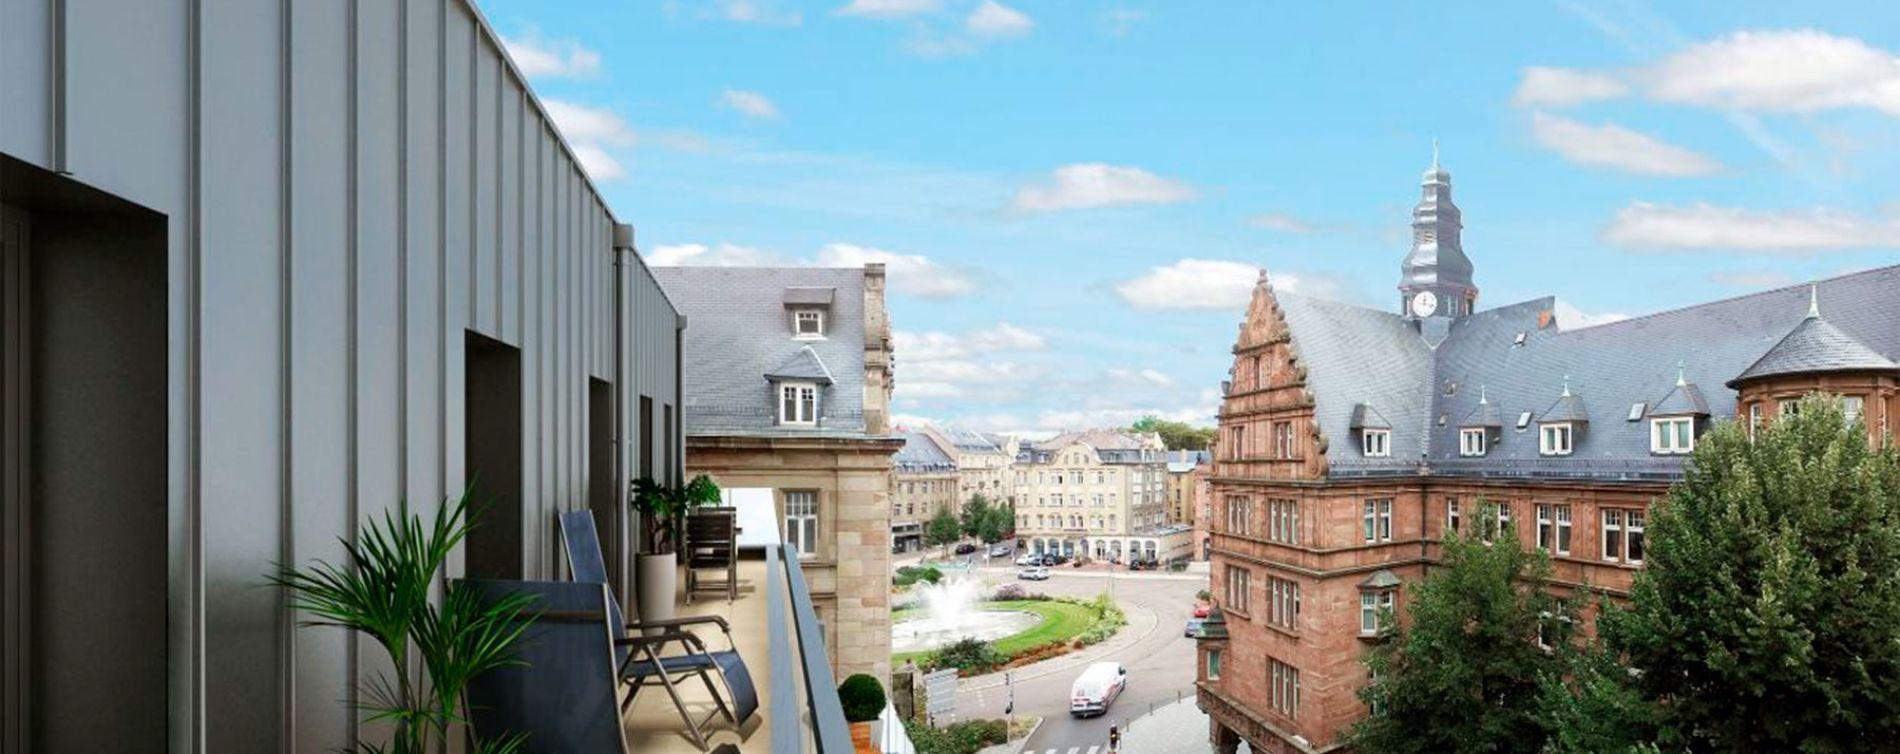 Résidence Oh Activ - Metz à Metz